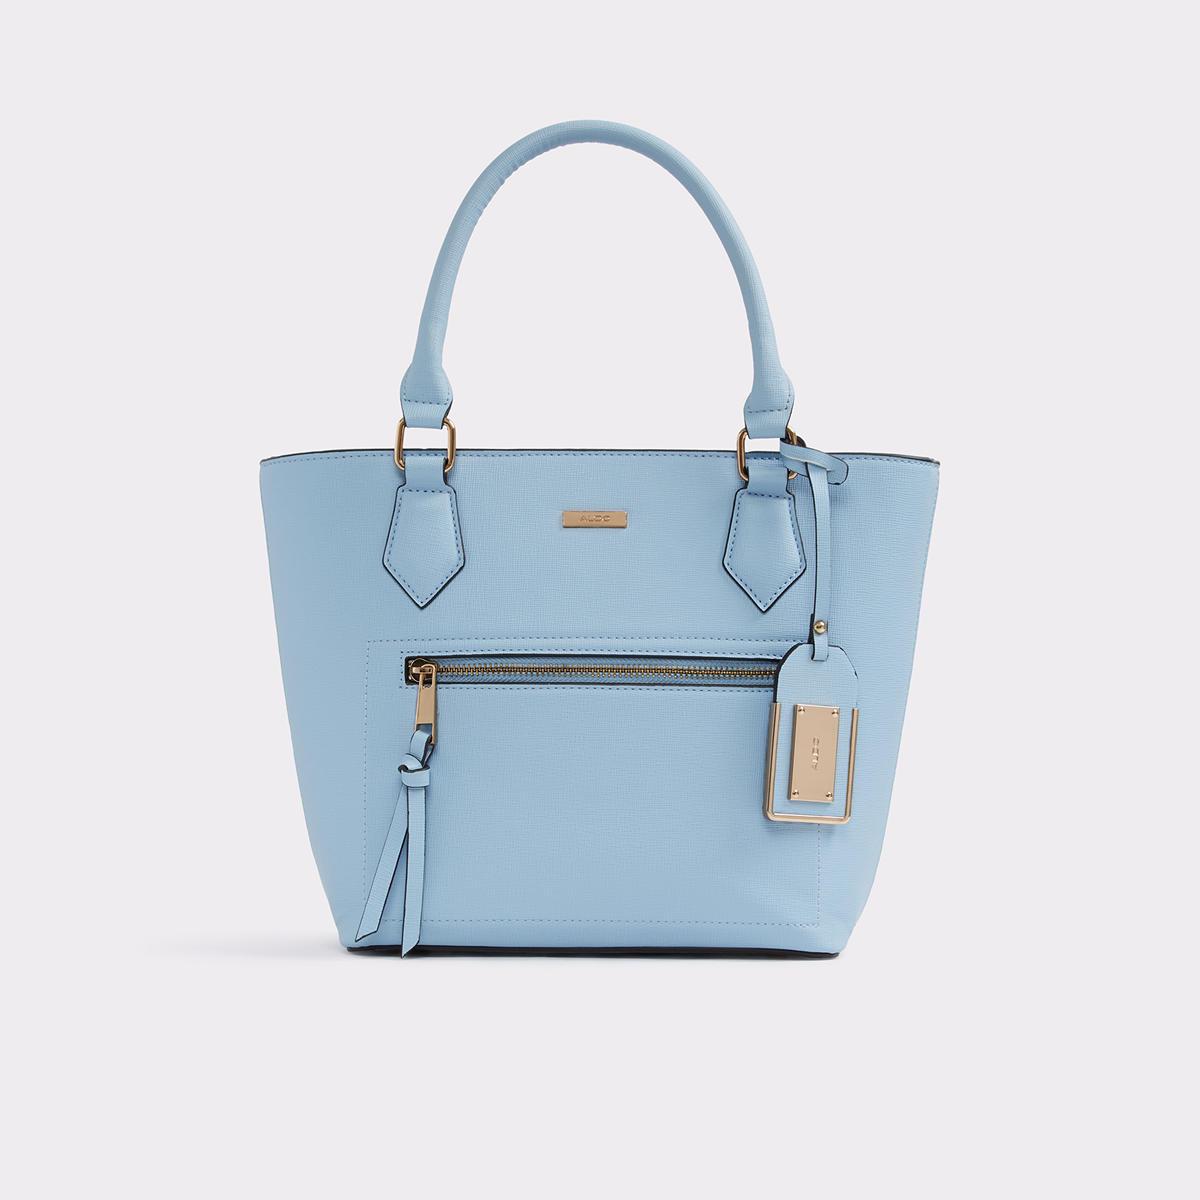 efc7df76b6f7a التنوع و الألوان الزاهية في حقائب النساء ماركة Aldo